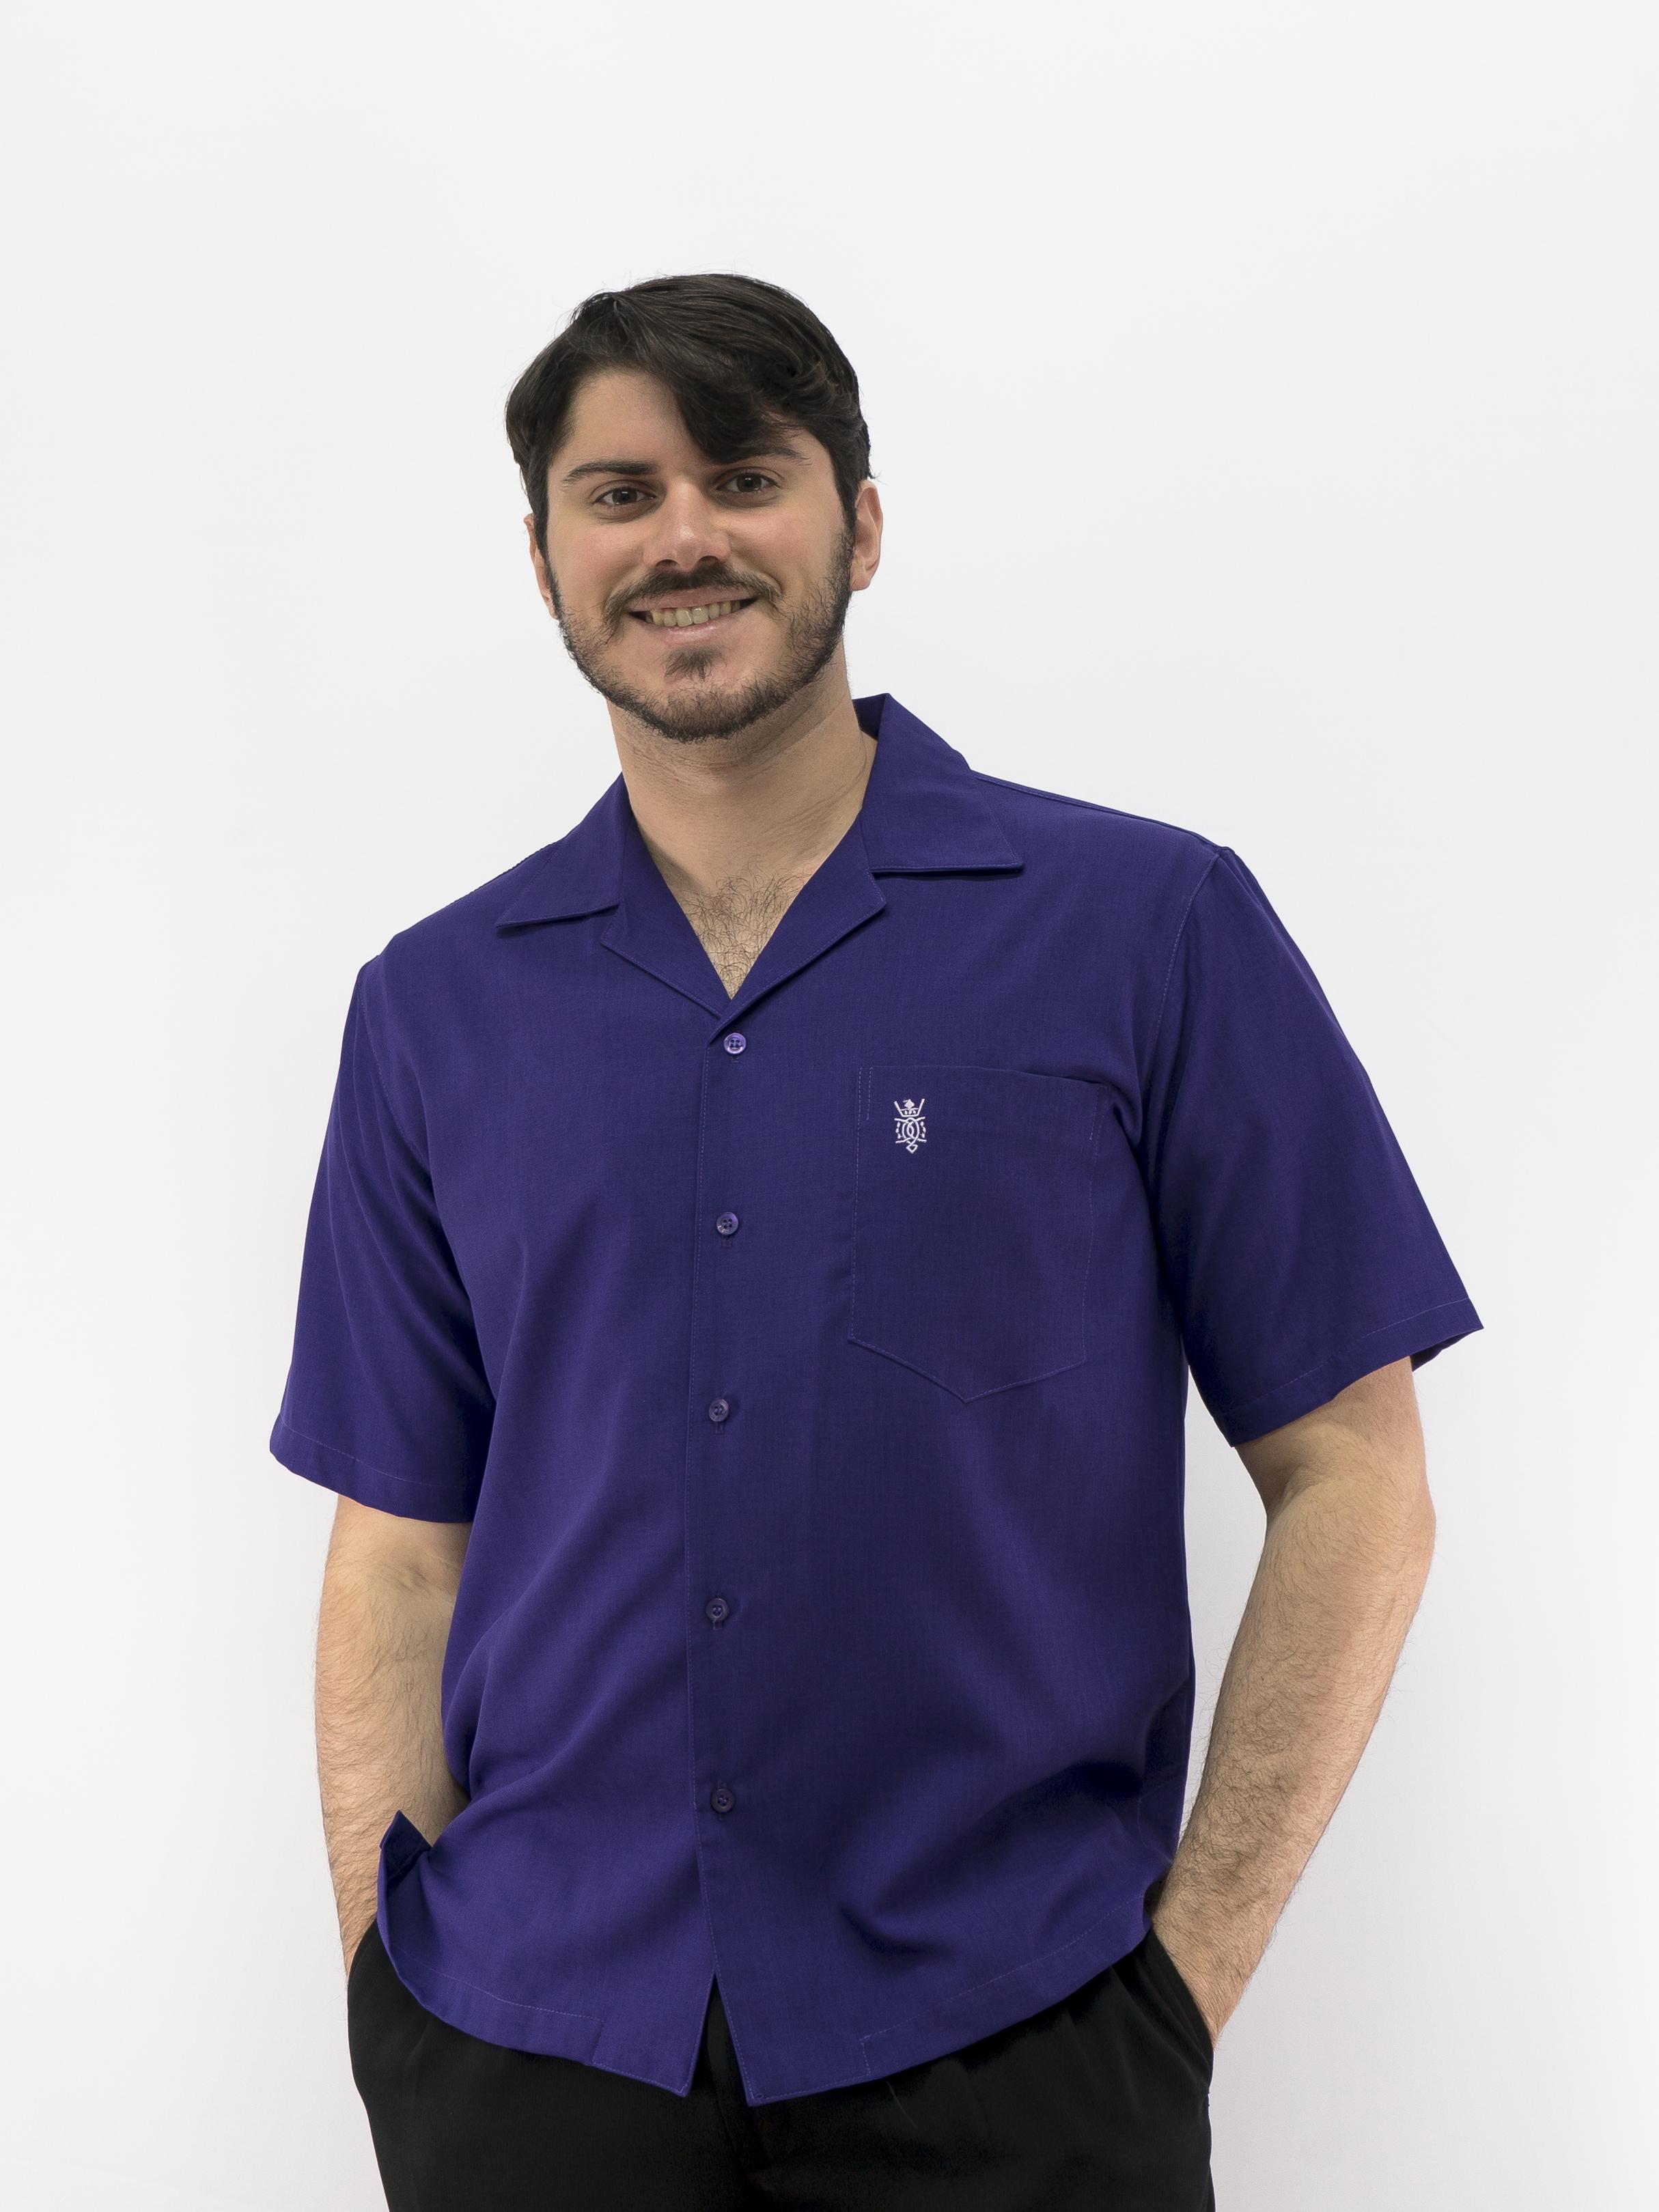 43d588414b4f24 Uniform Shirt Men's Casual Shirt Purple D'Accord 5152U Made in USA SOLD OUT